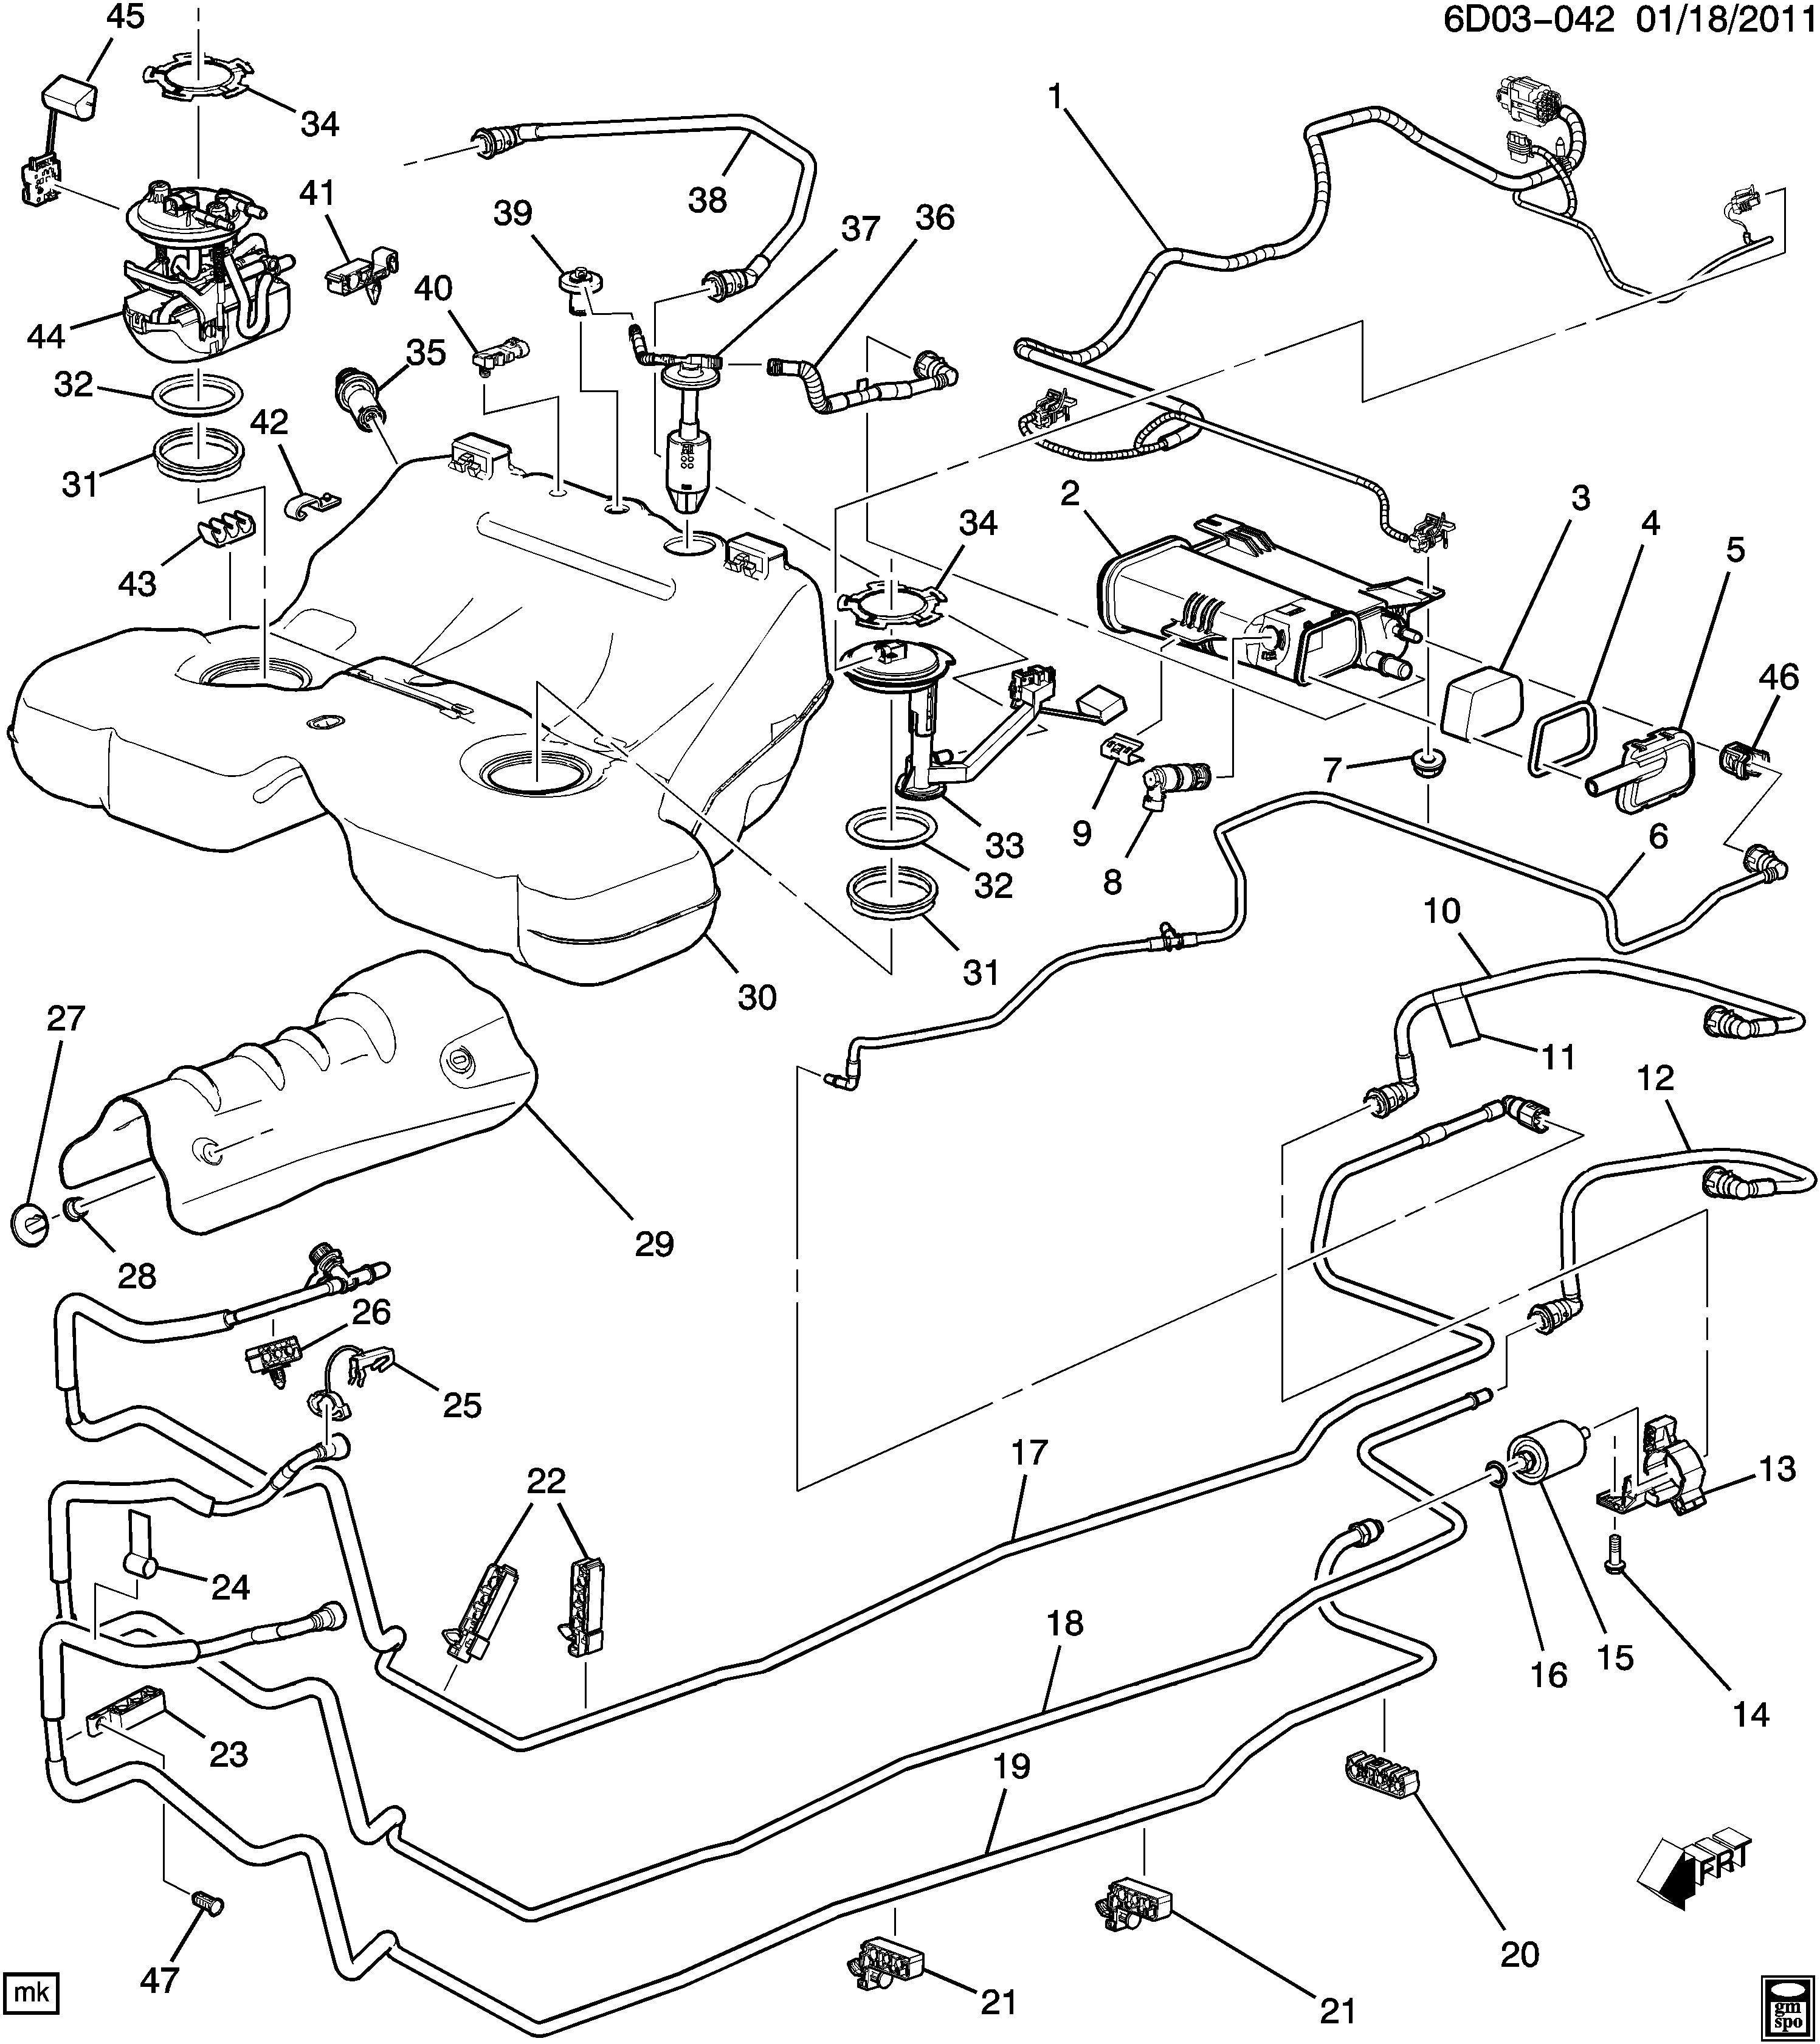 2003 cadillac cts fuel tank auto pinterest cadillac cts and